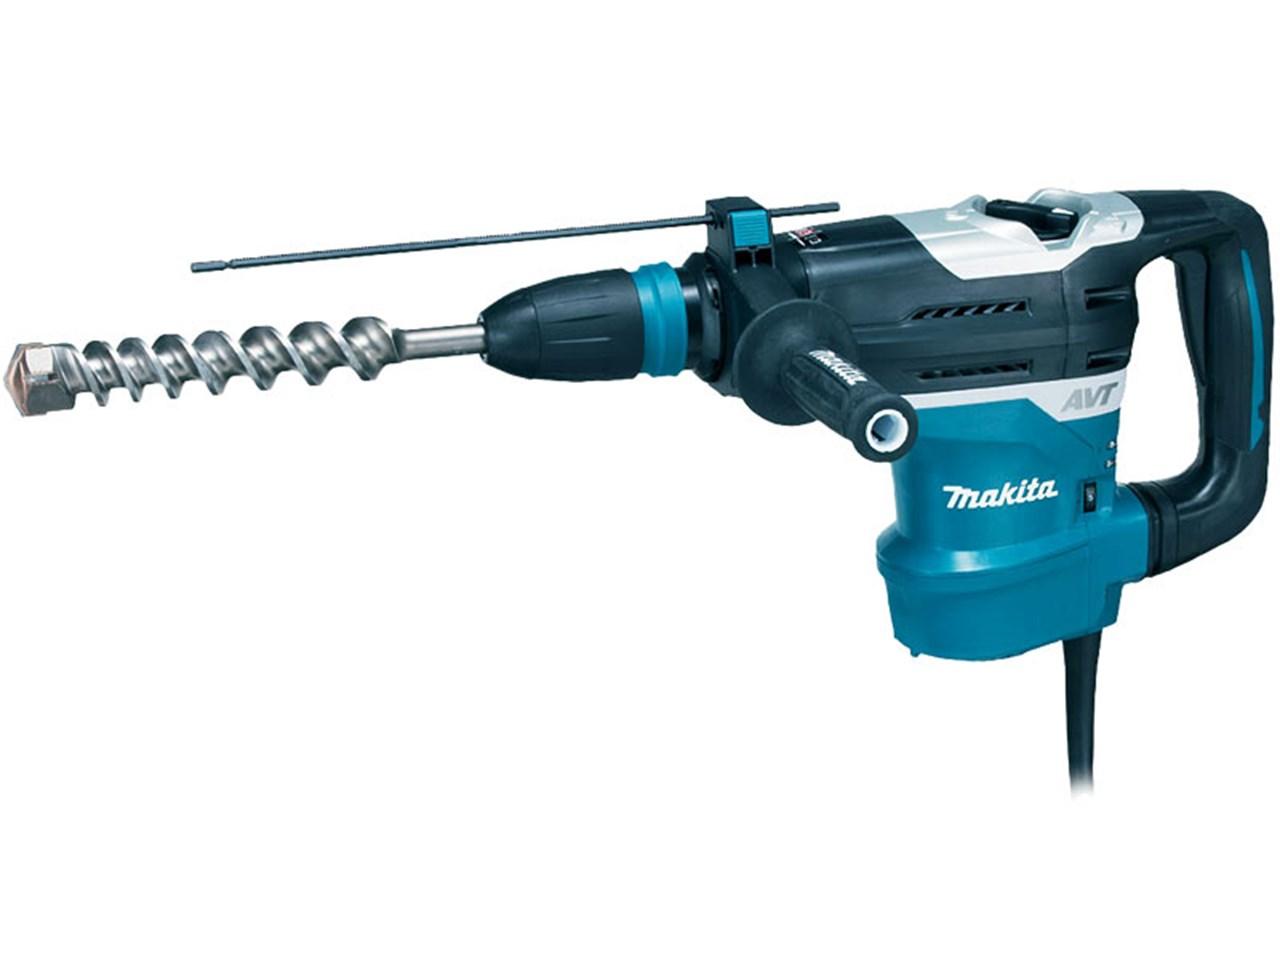 makita hr4013c 1 110v sds max rotary hammer. Black Bedroom Furniture Sets. Home Design Ideas